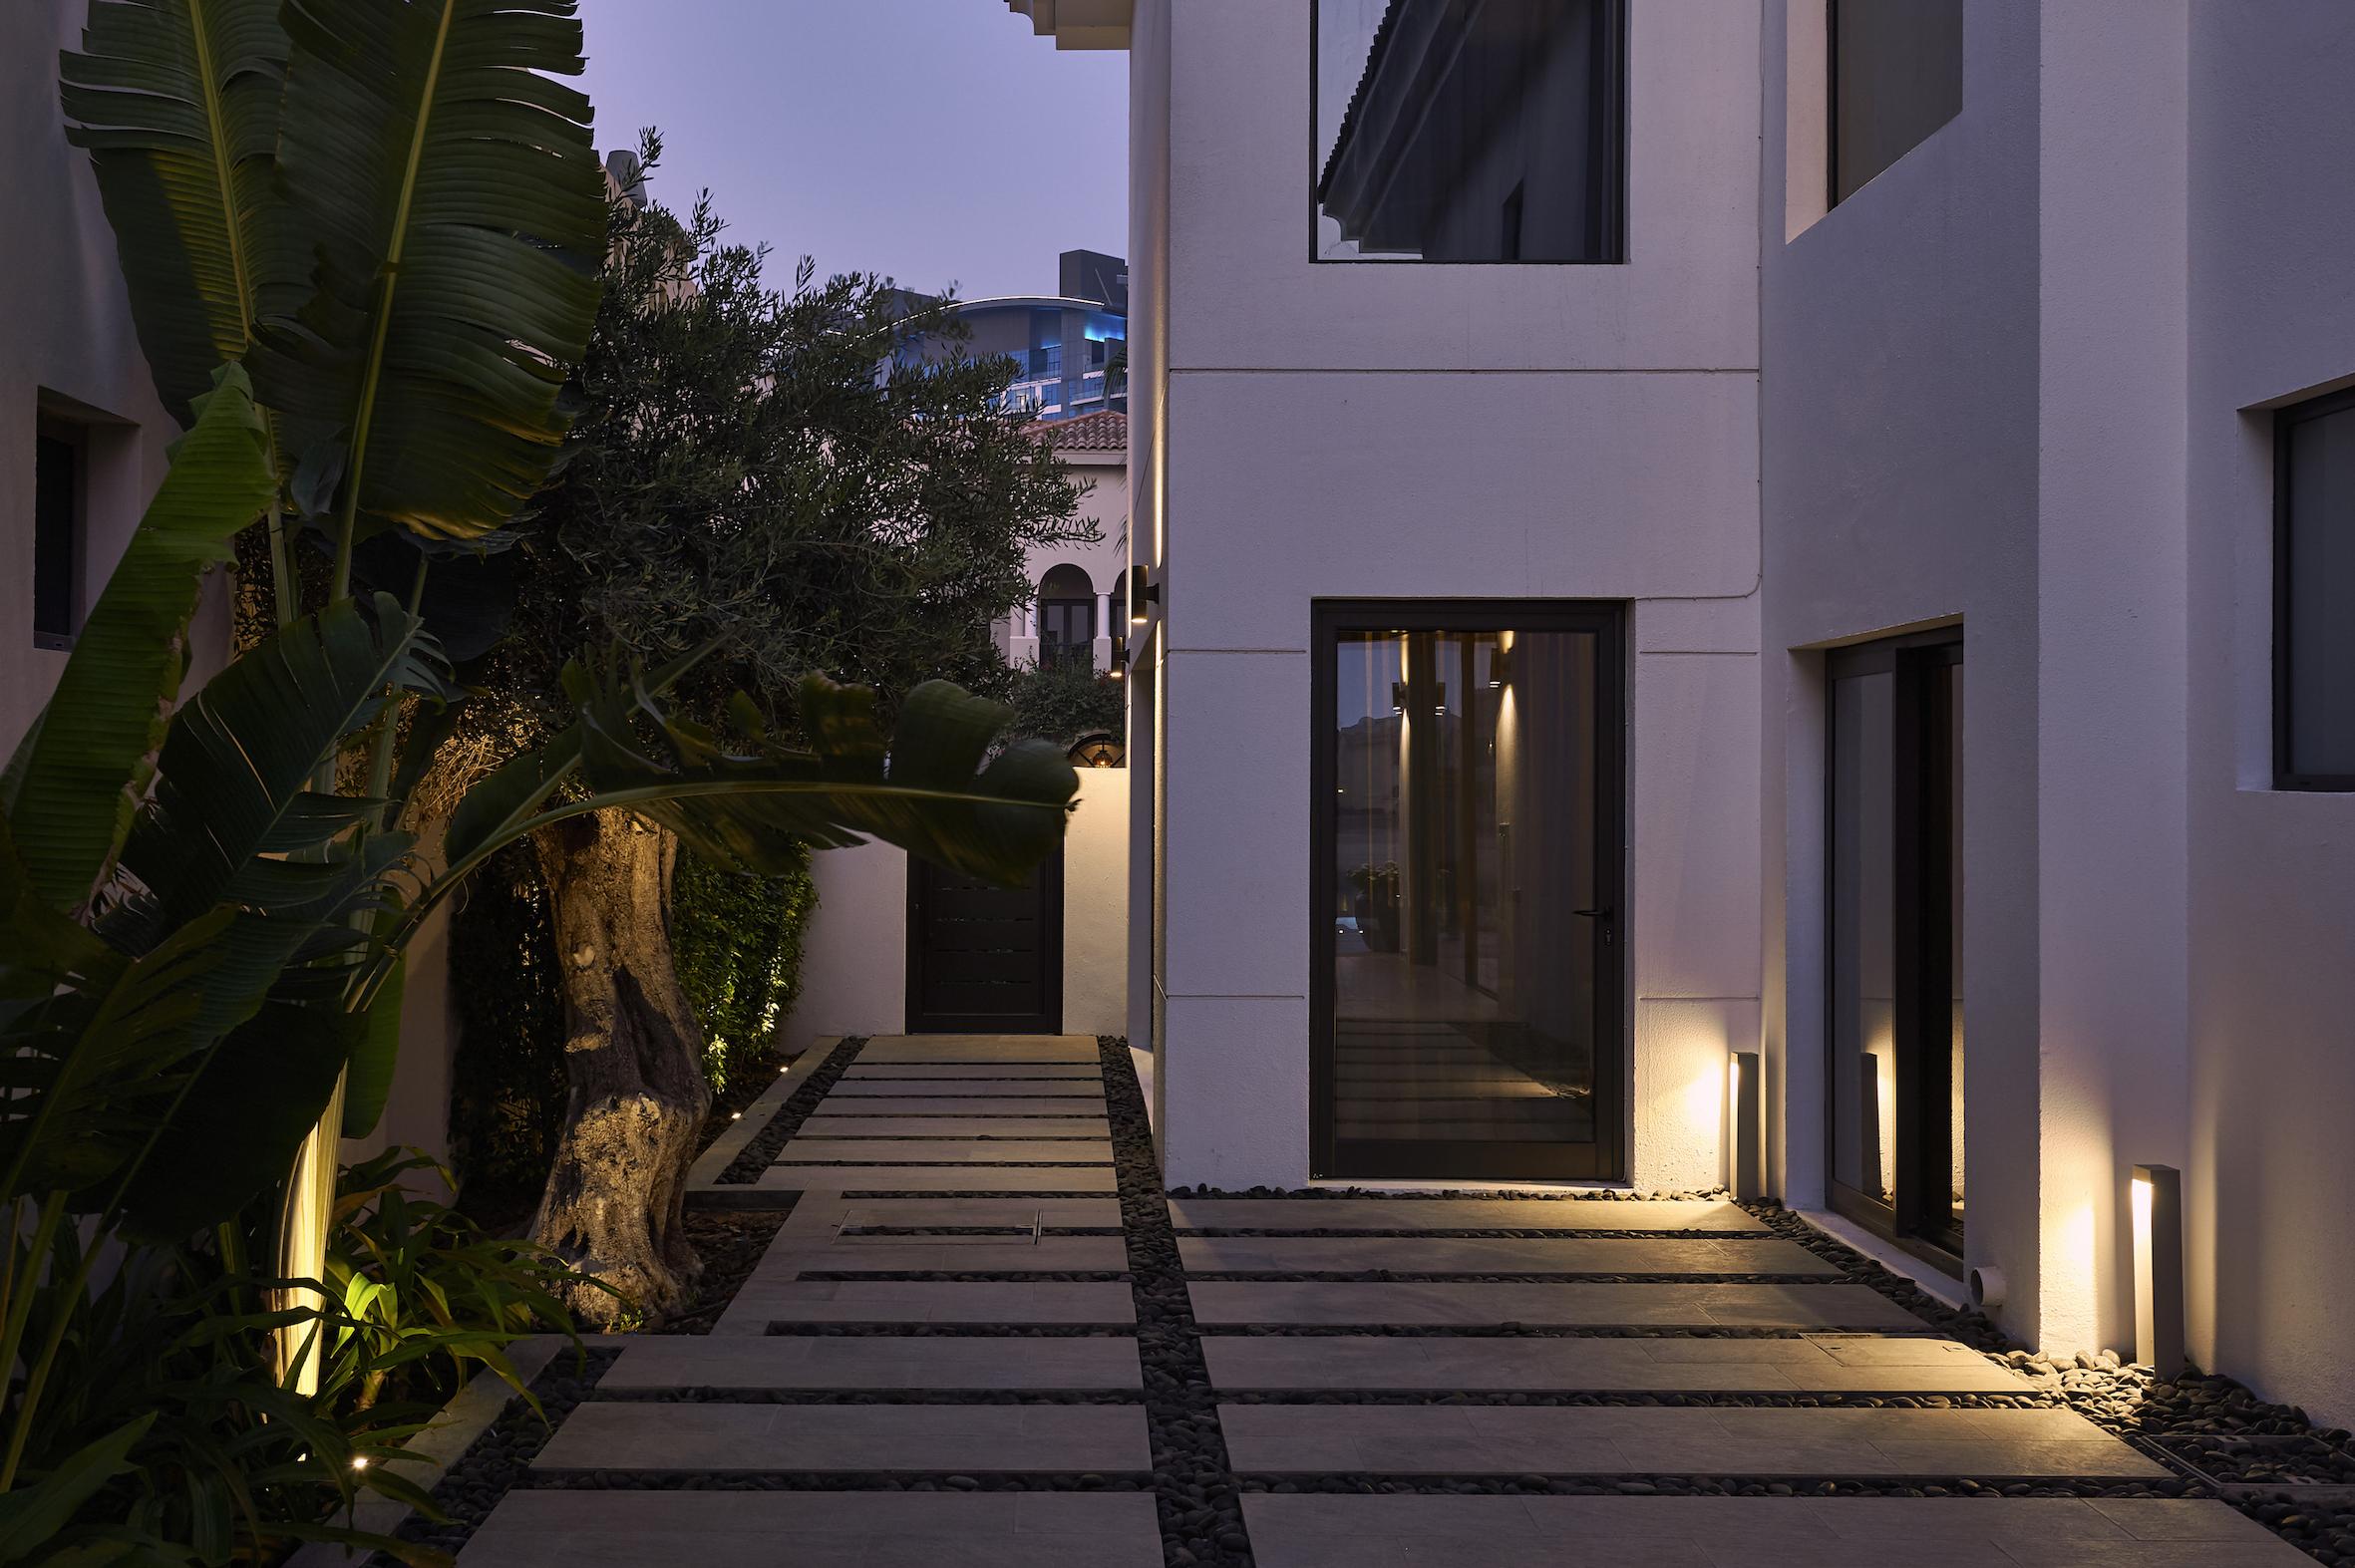 Nader-Gammas-Lighting-Design-Palm-Landscape.JPG